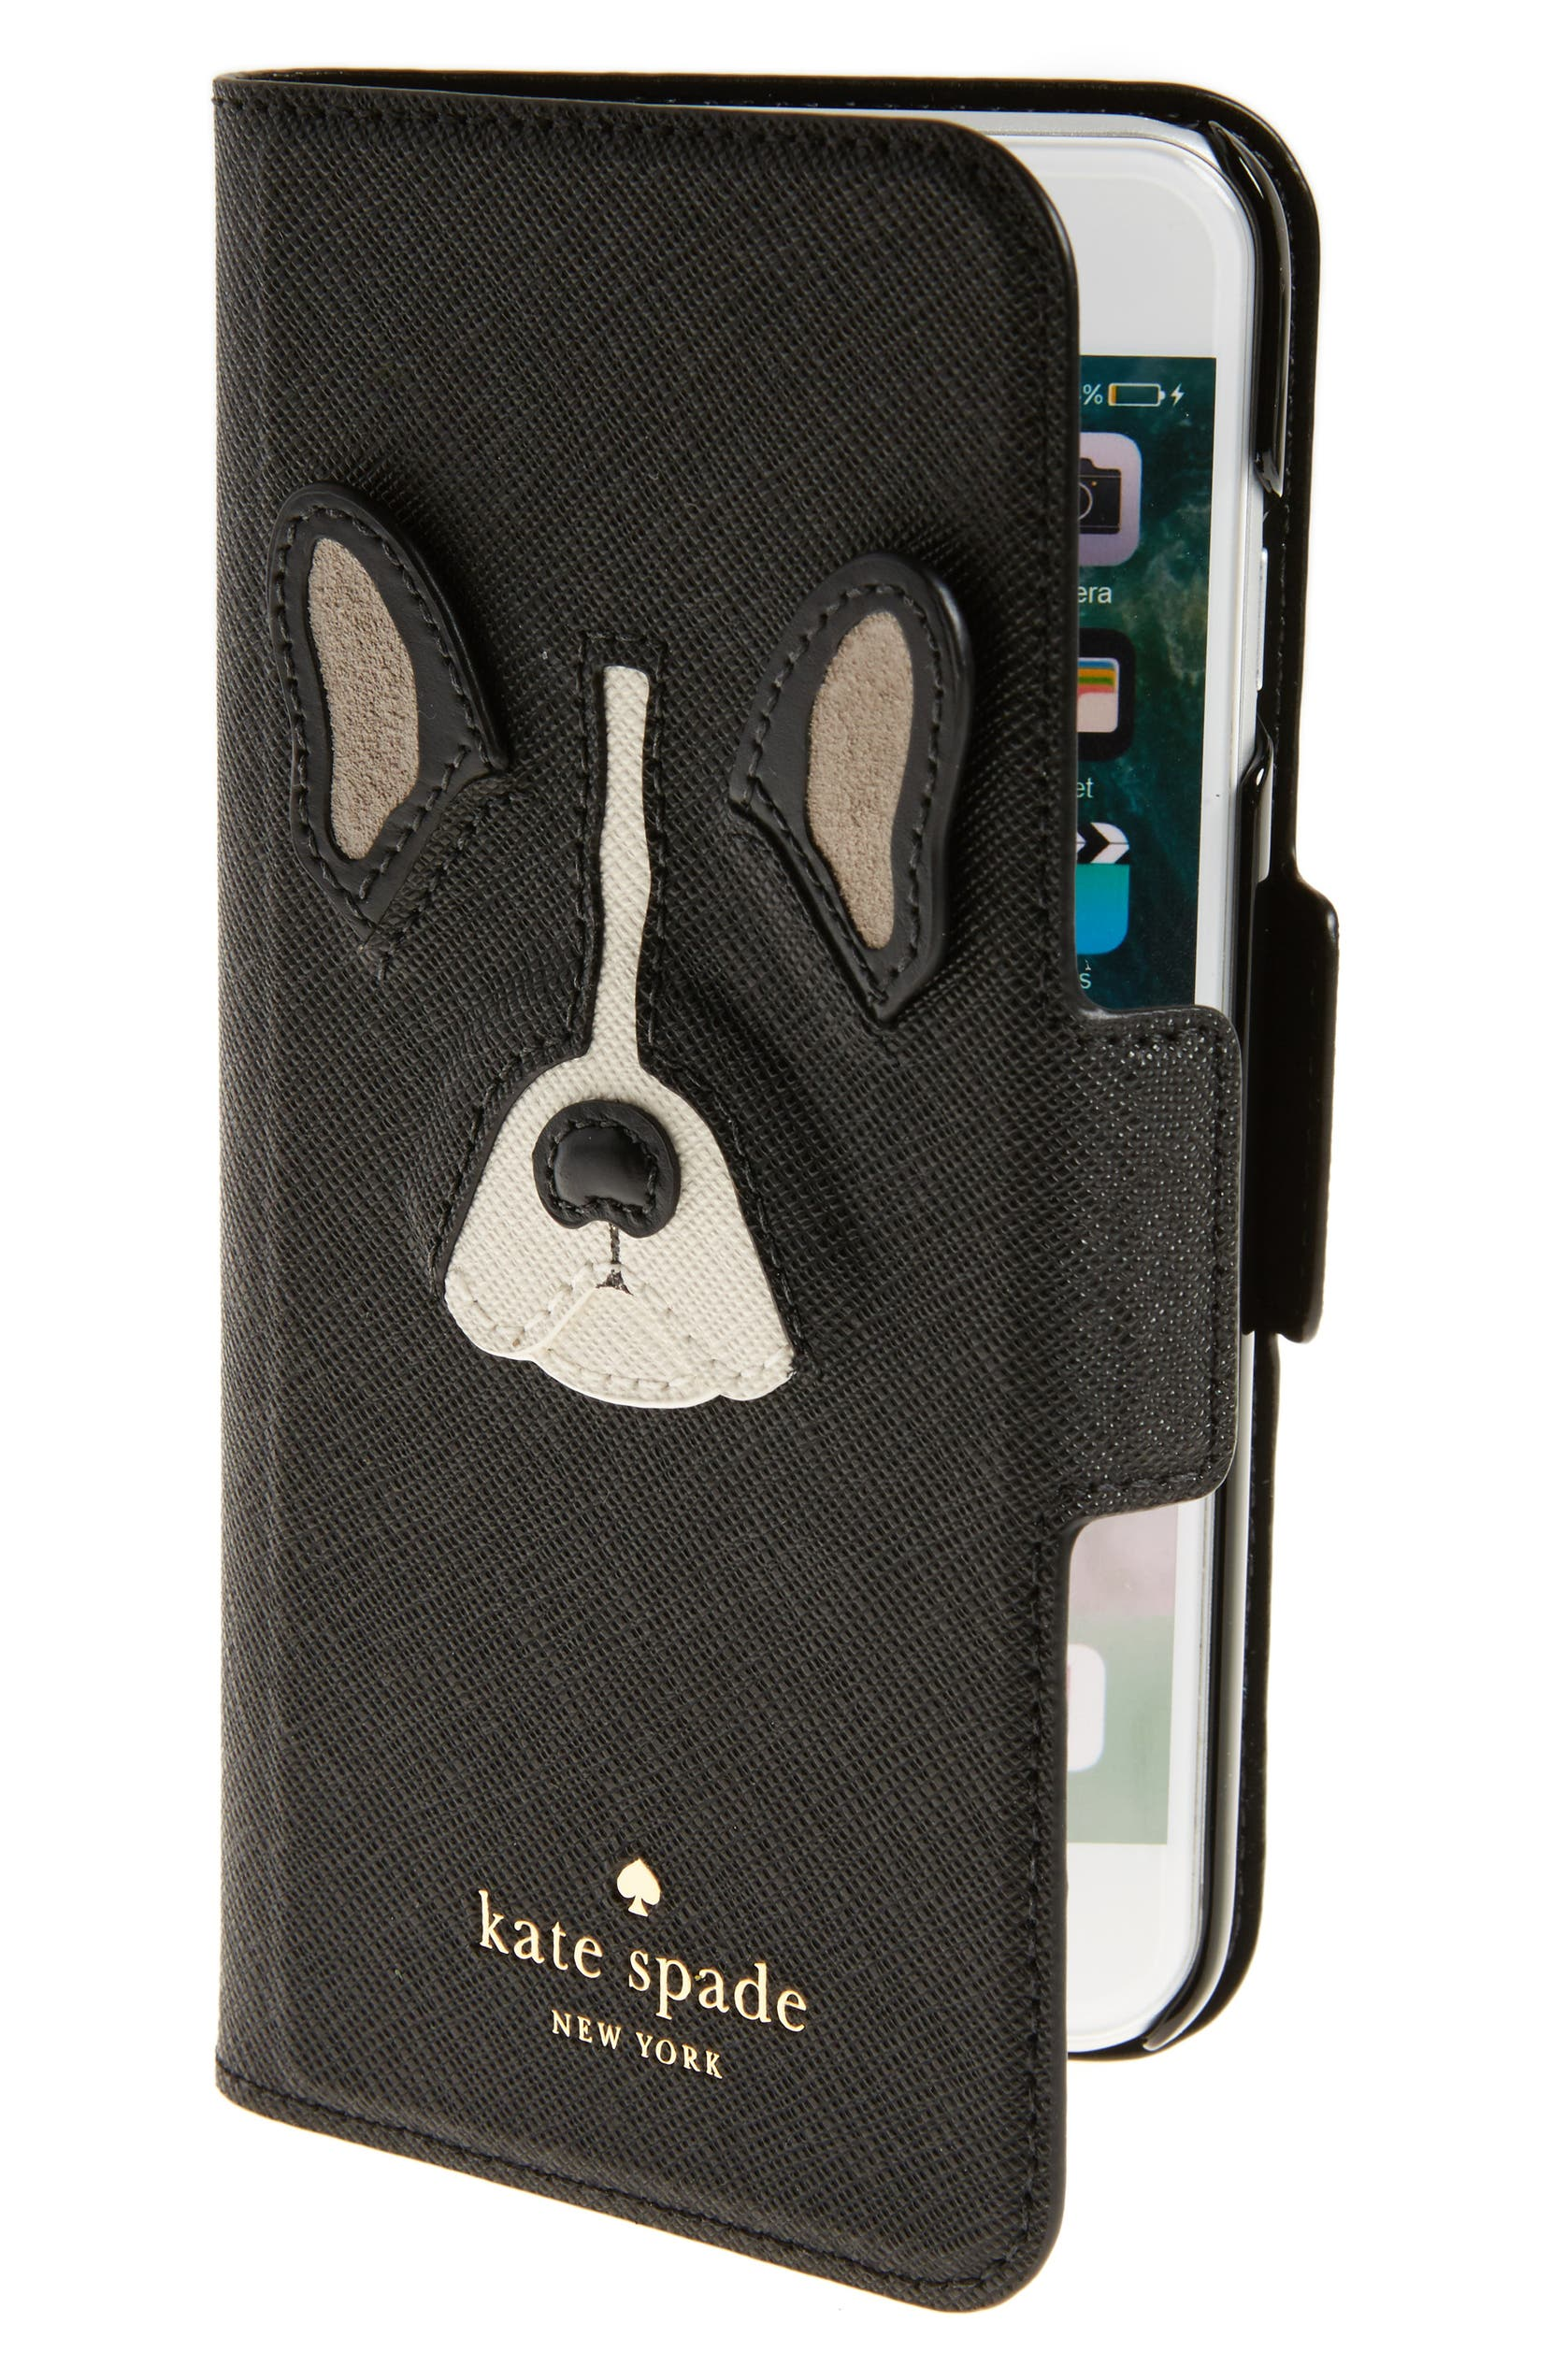 new styles 2e146 1bcac kate spade new york antoine appliqué leather iPhone 7/8 folio case ...